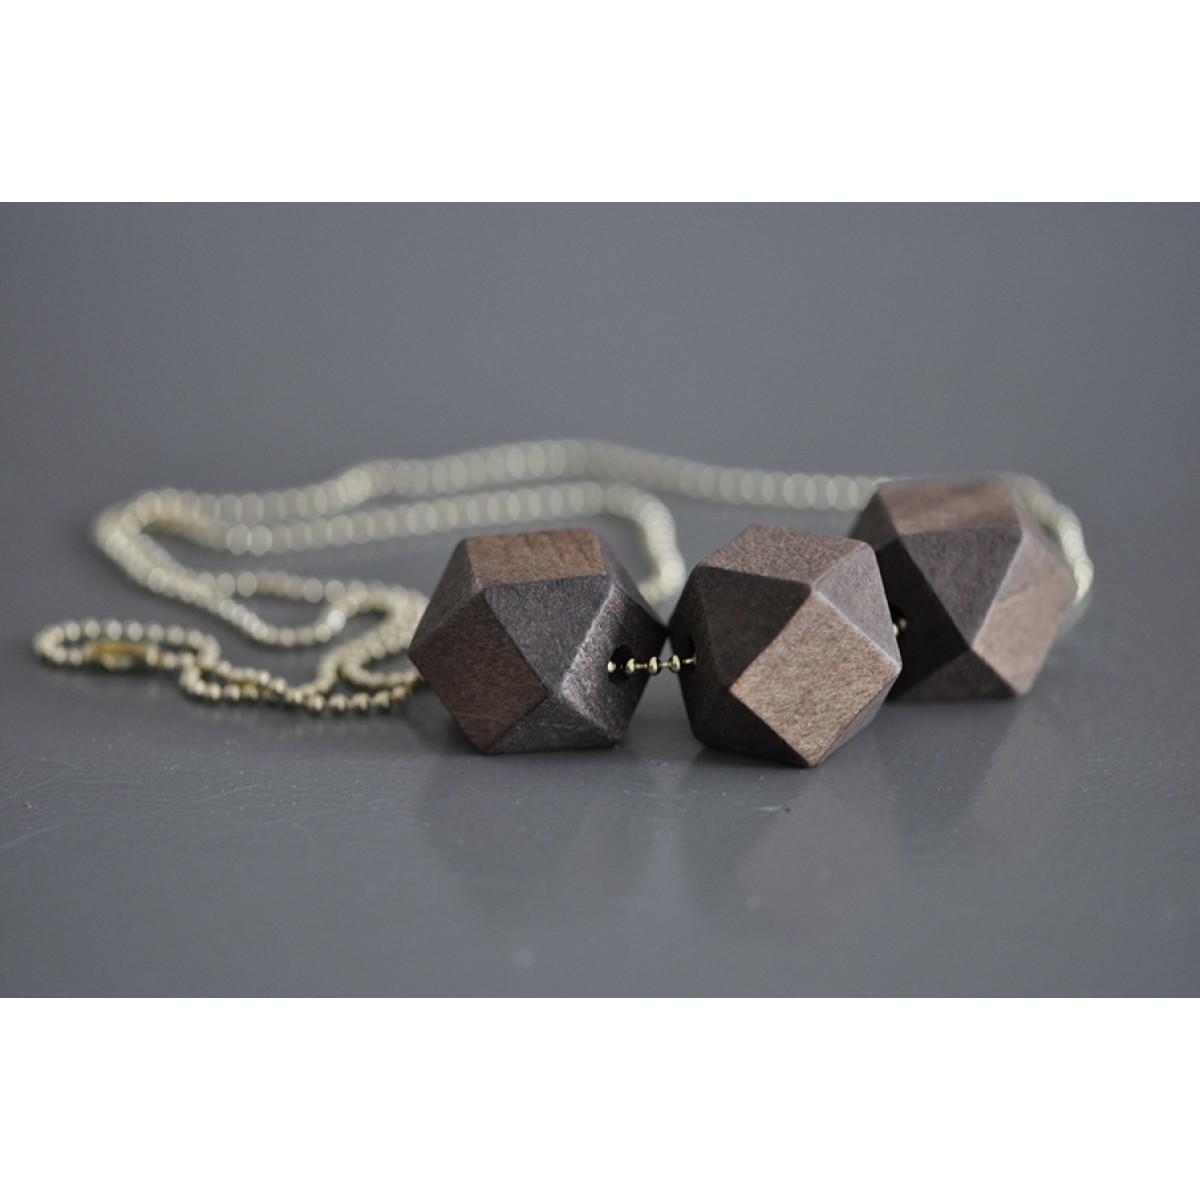 nahili geometric wood *Gold* geometrische, minimale Holzkette